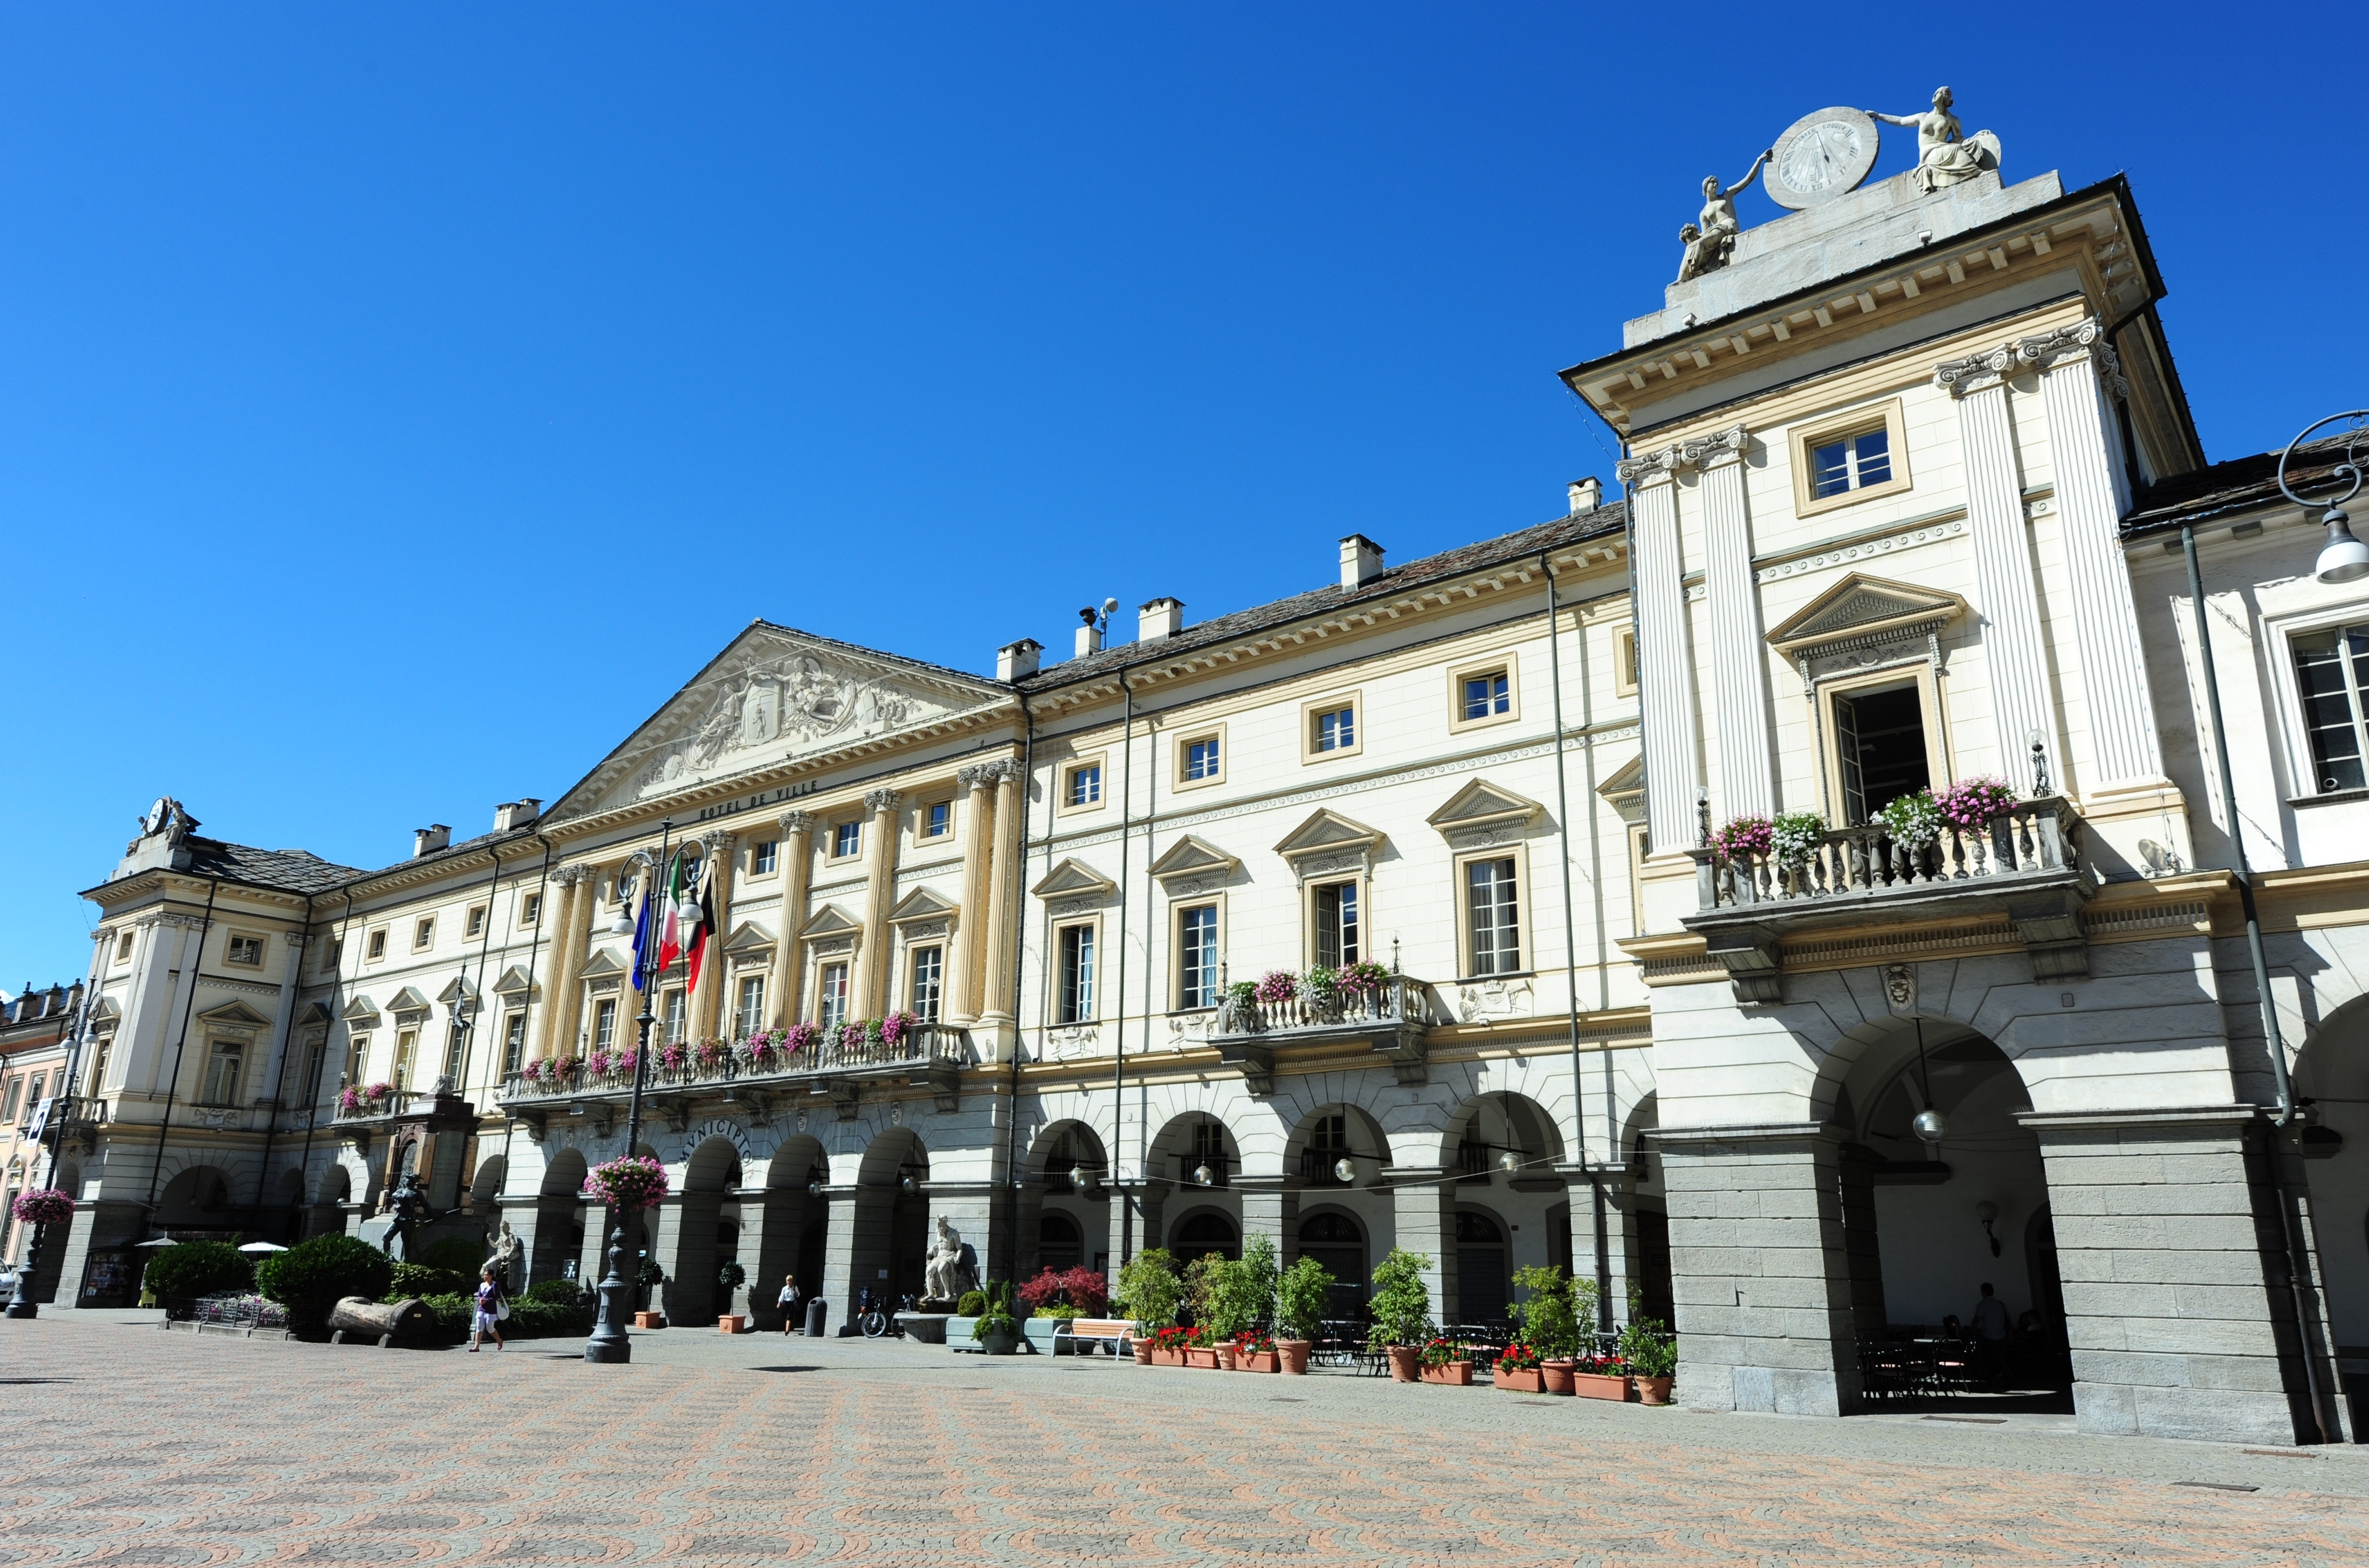 foto municipio Aosta